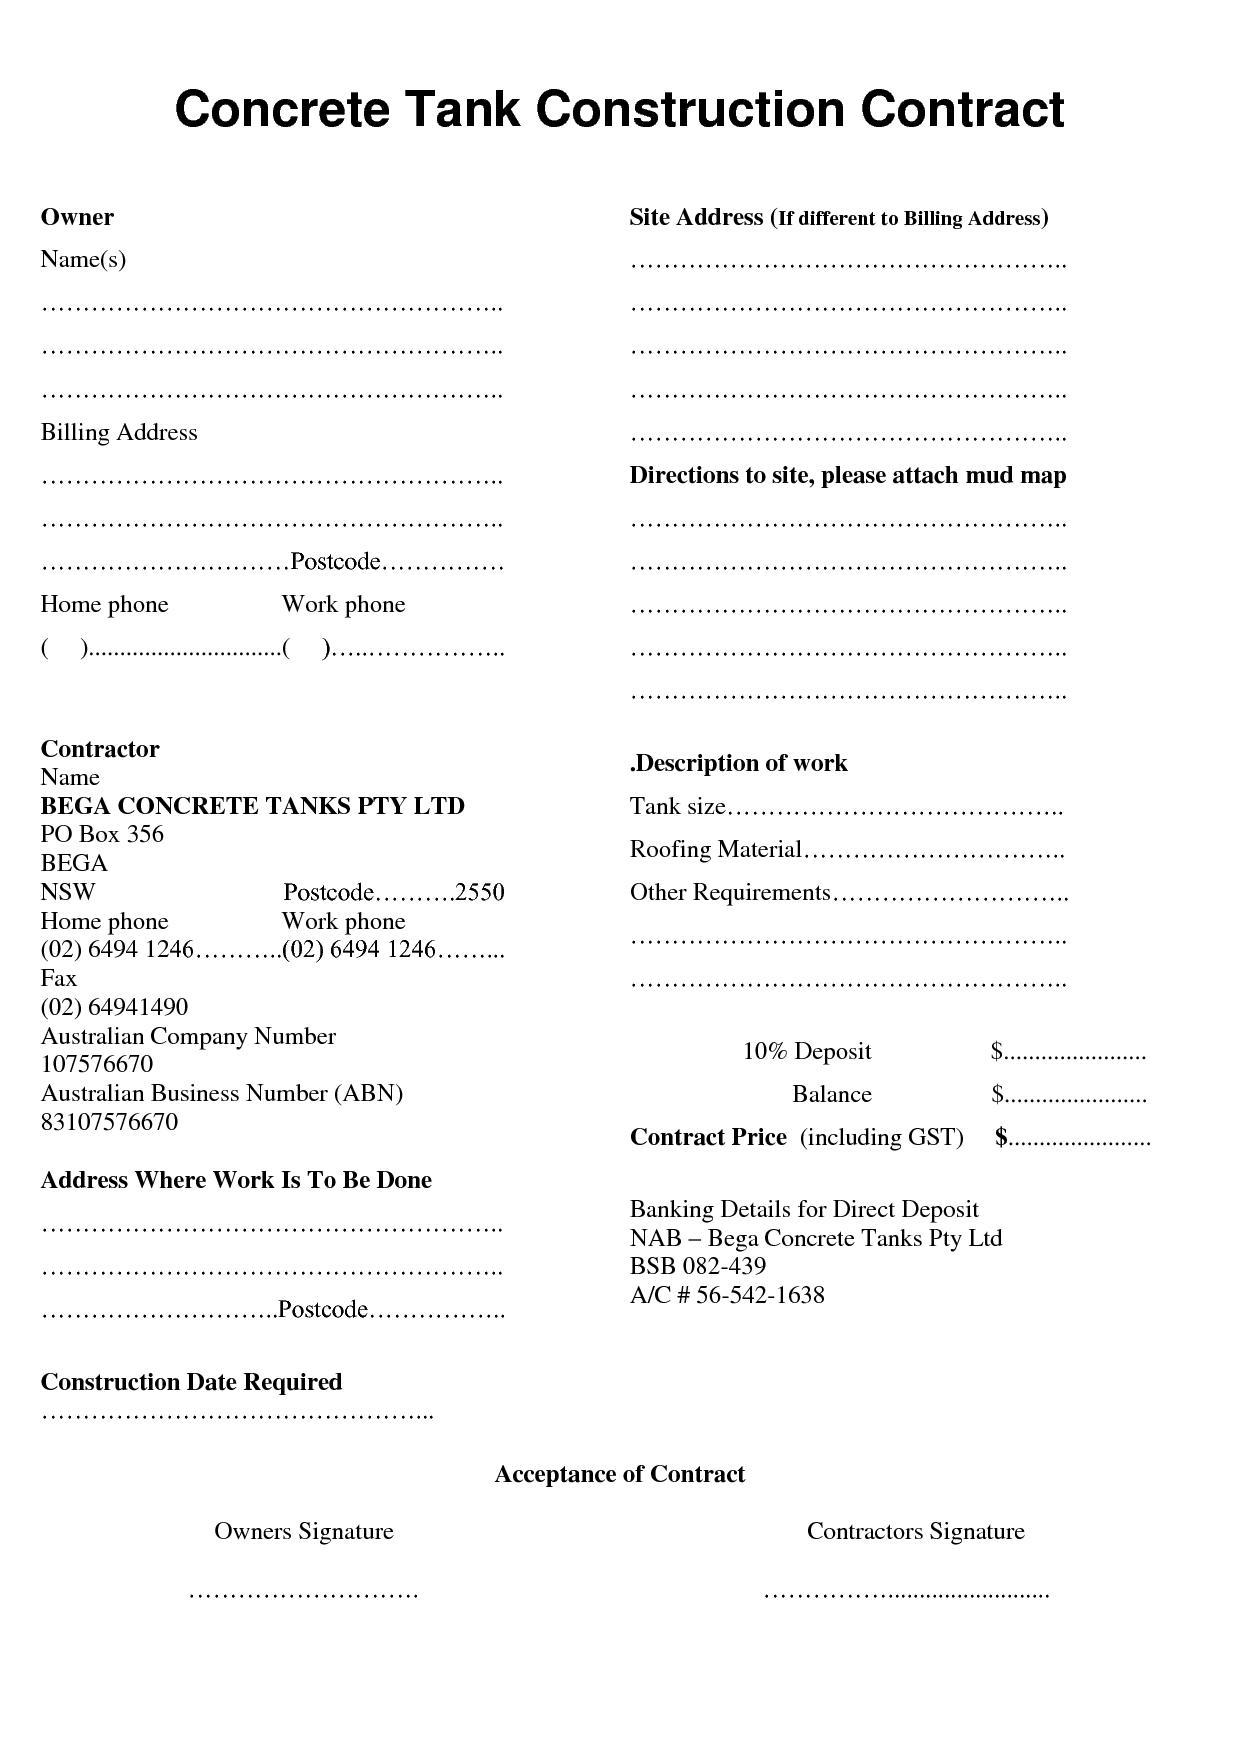 Concrete Contract Template